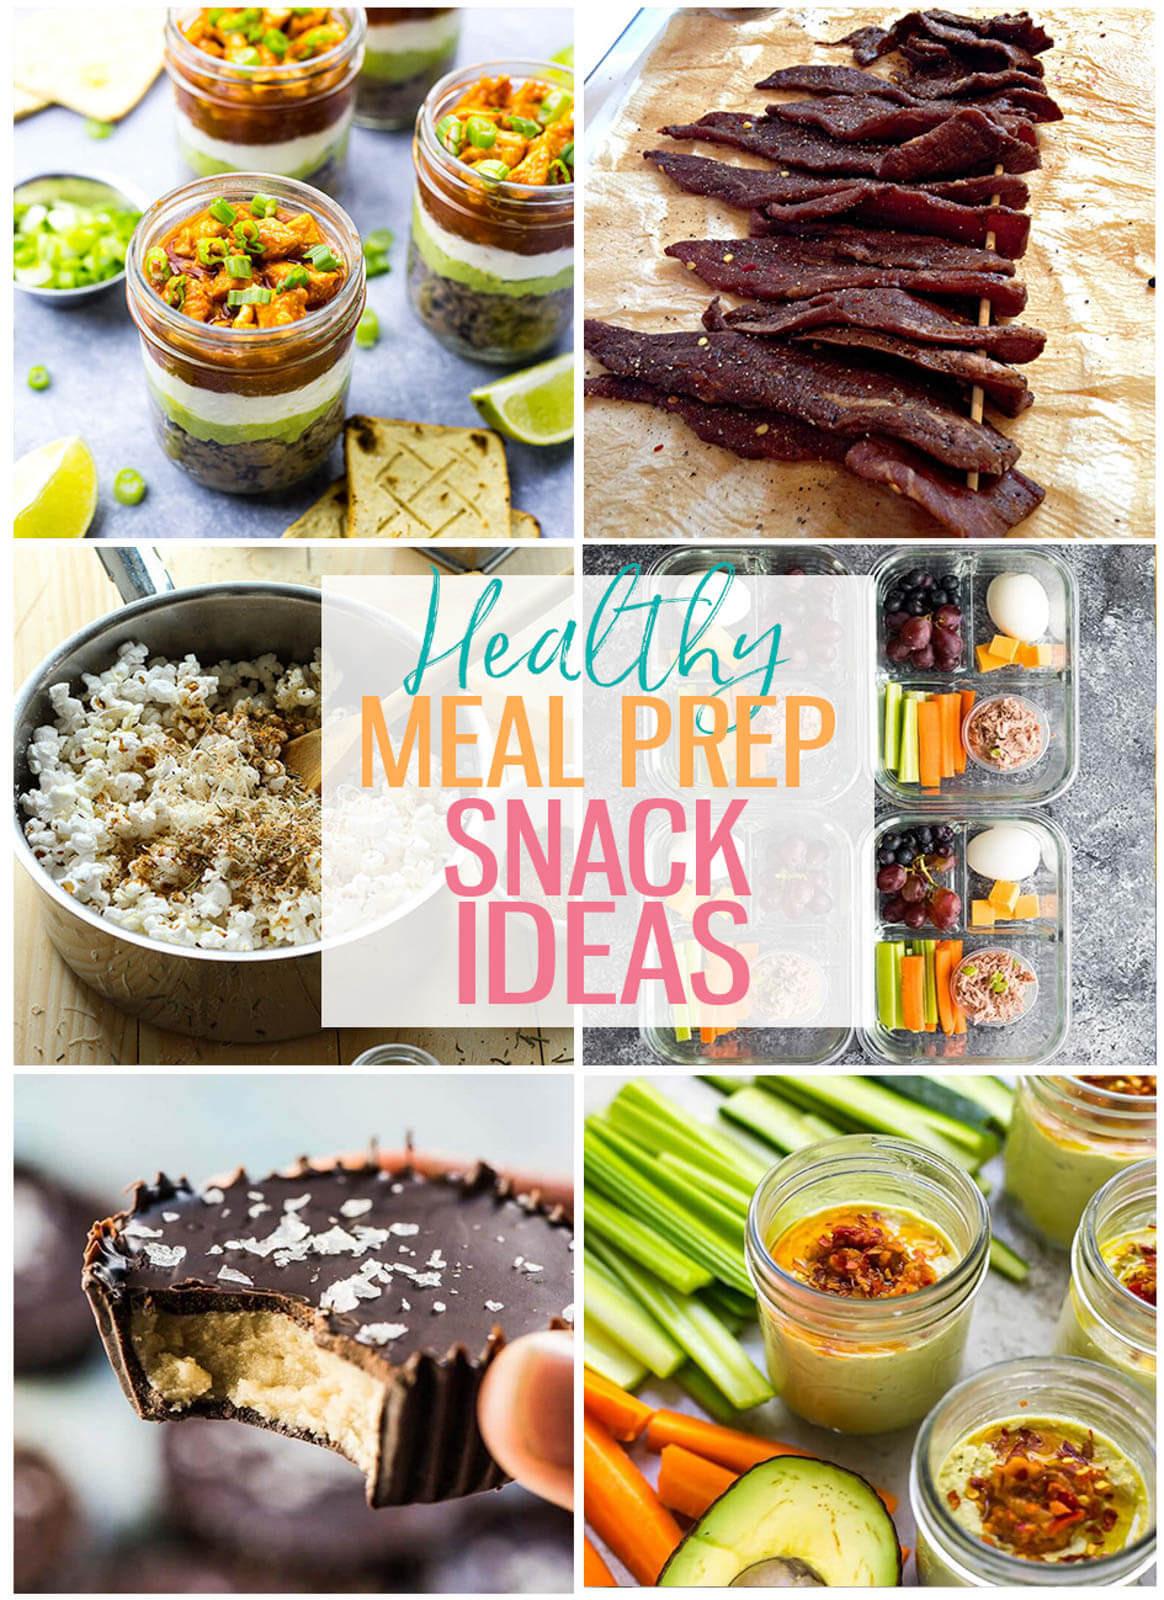 Healthy Meal Prep Snacks  18 Meal Prep Healthy Snacks for Work The Girl on Bloor